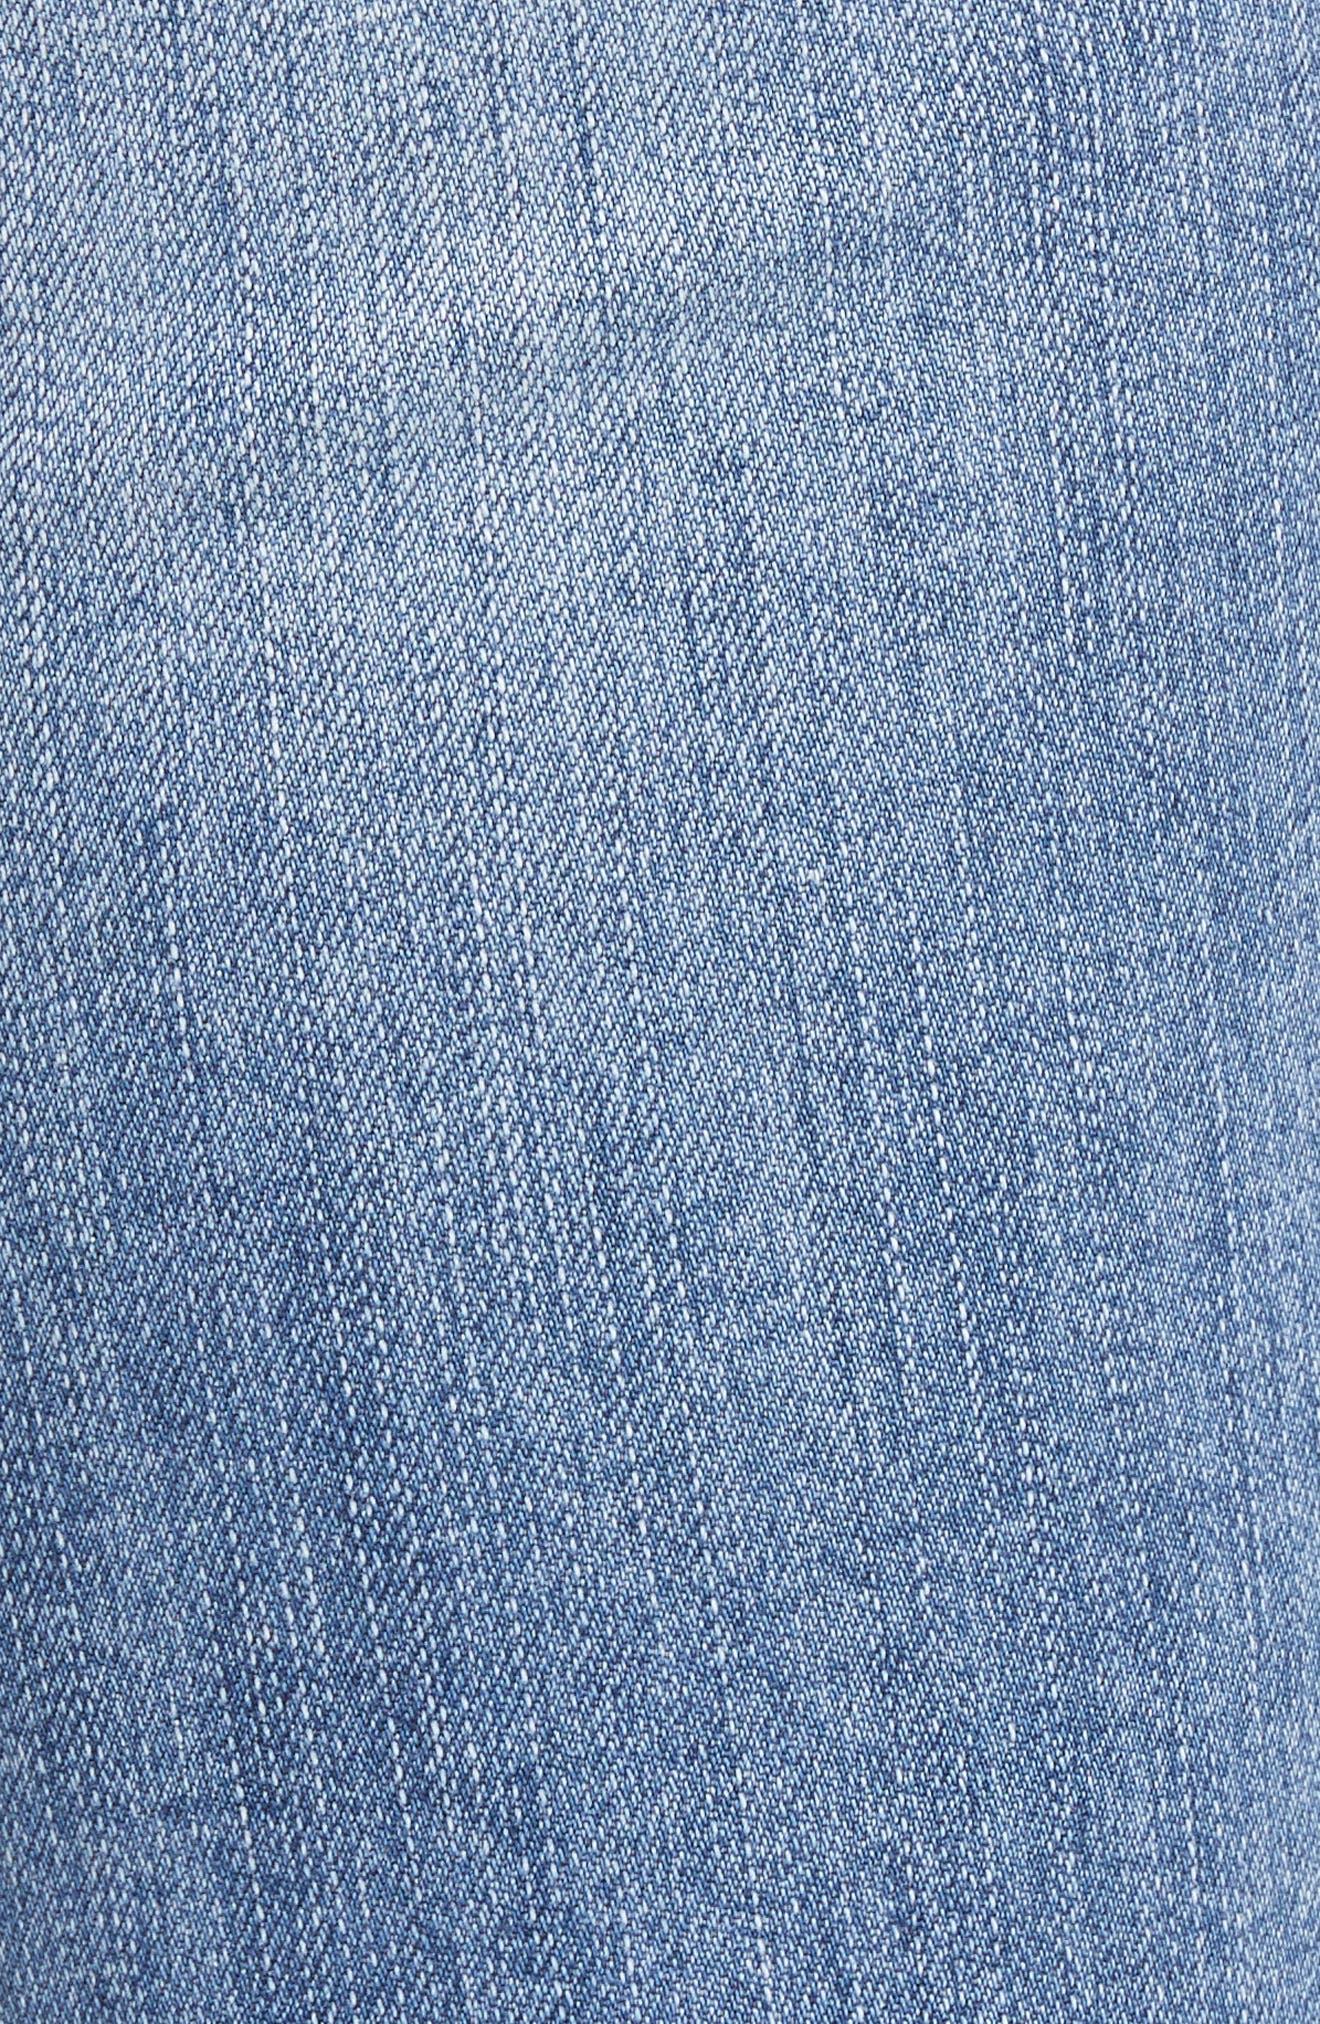 Reese Pearl Detail Raw Edge Jeans,                             Alternate thumbnail 5, color,                             Assess W/ Medium Base Wash